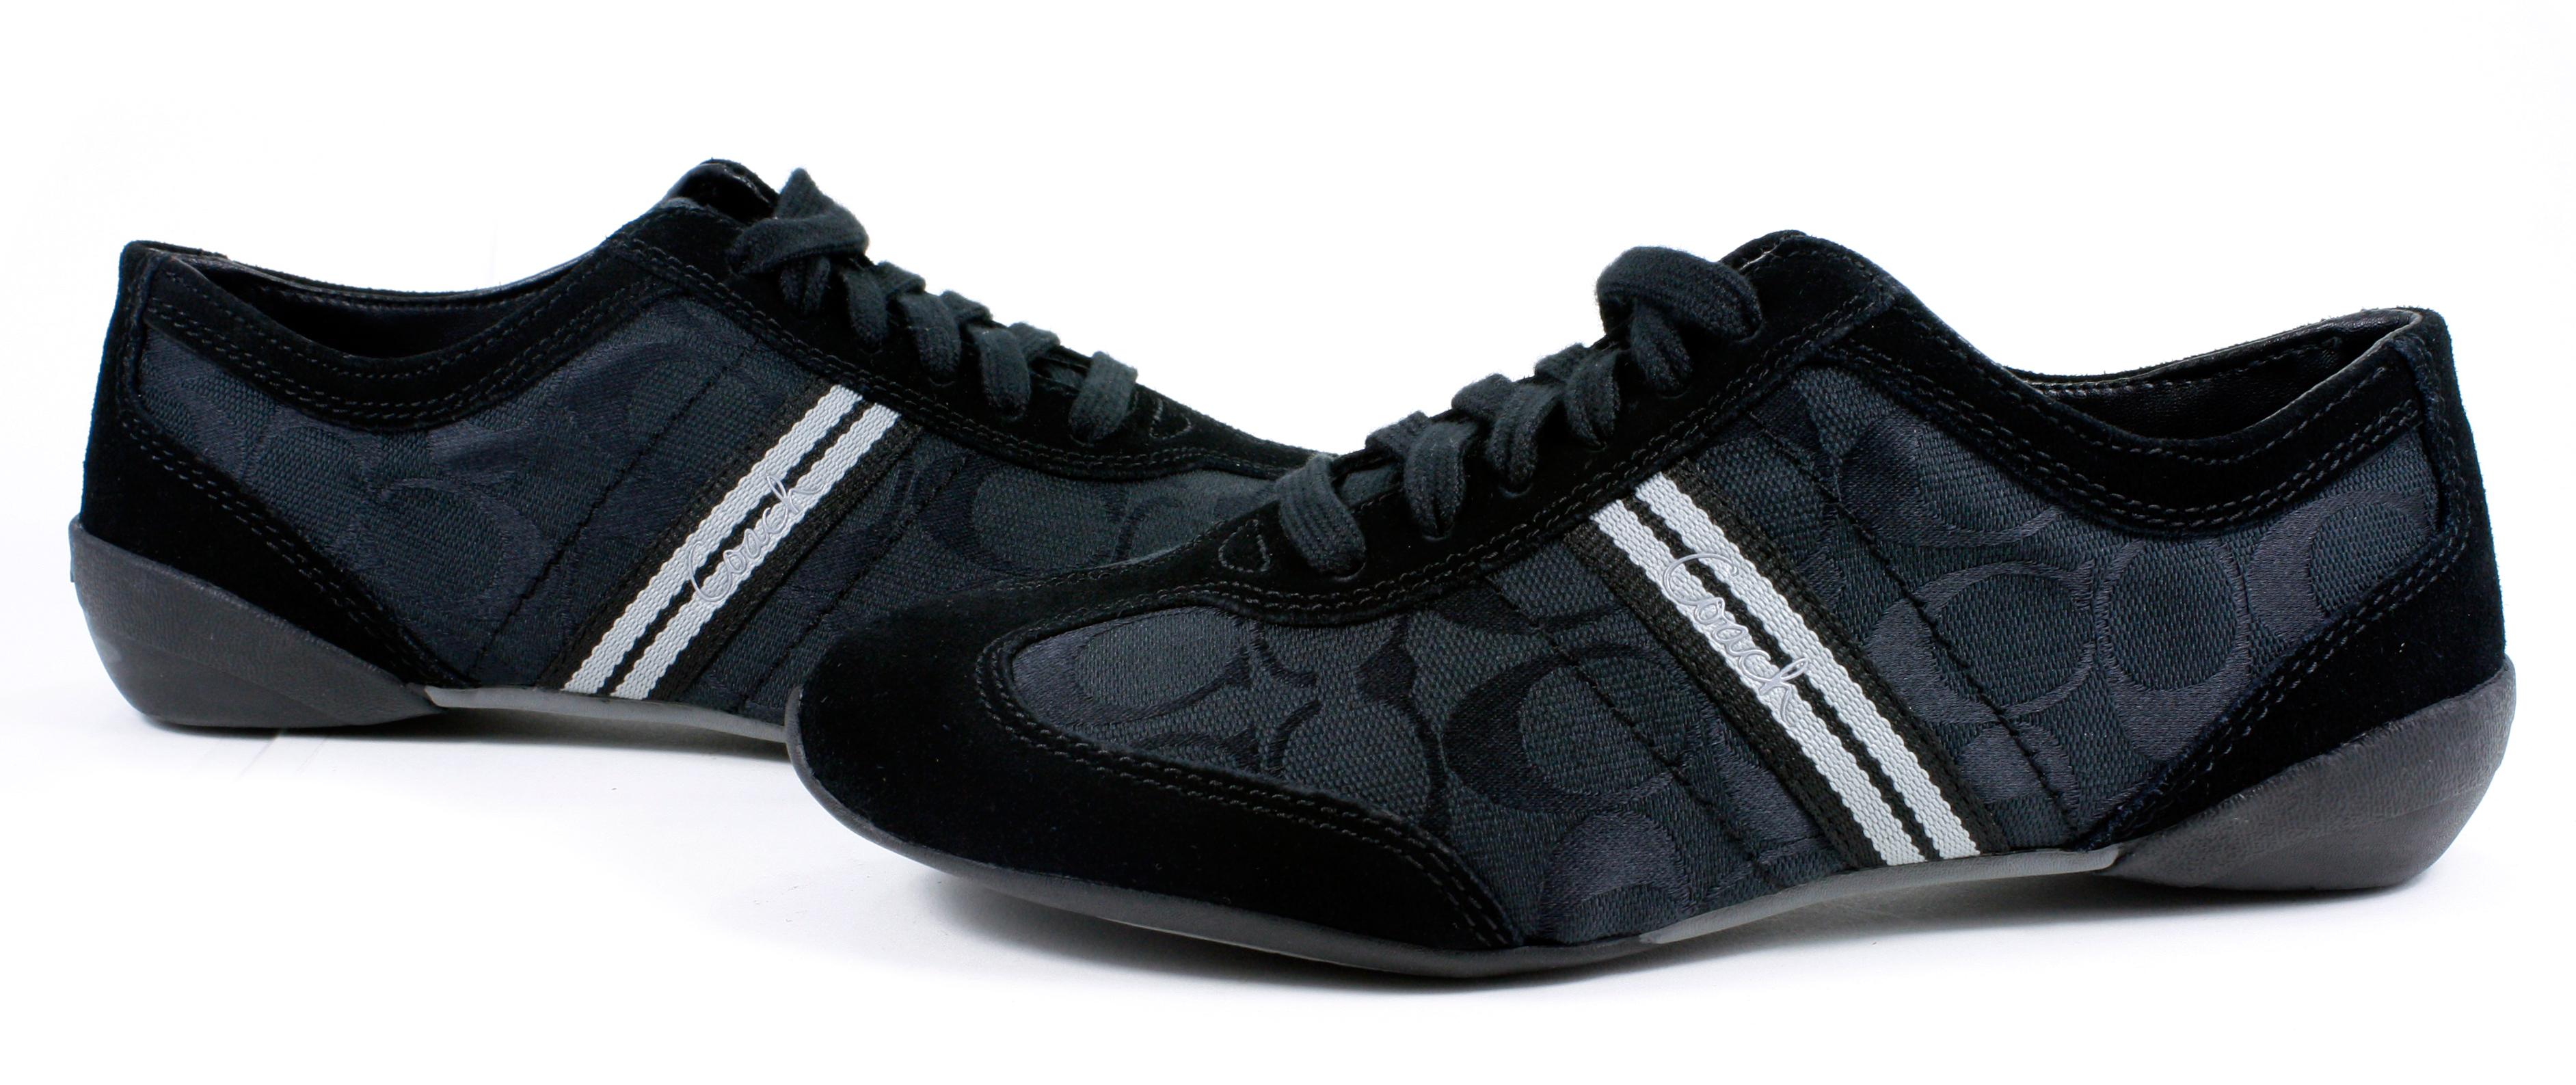 Coach Signature Beyla 12CM Black Logo Sneakers Tennis ...